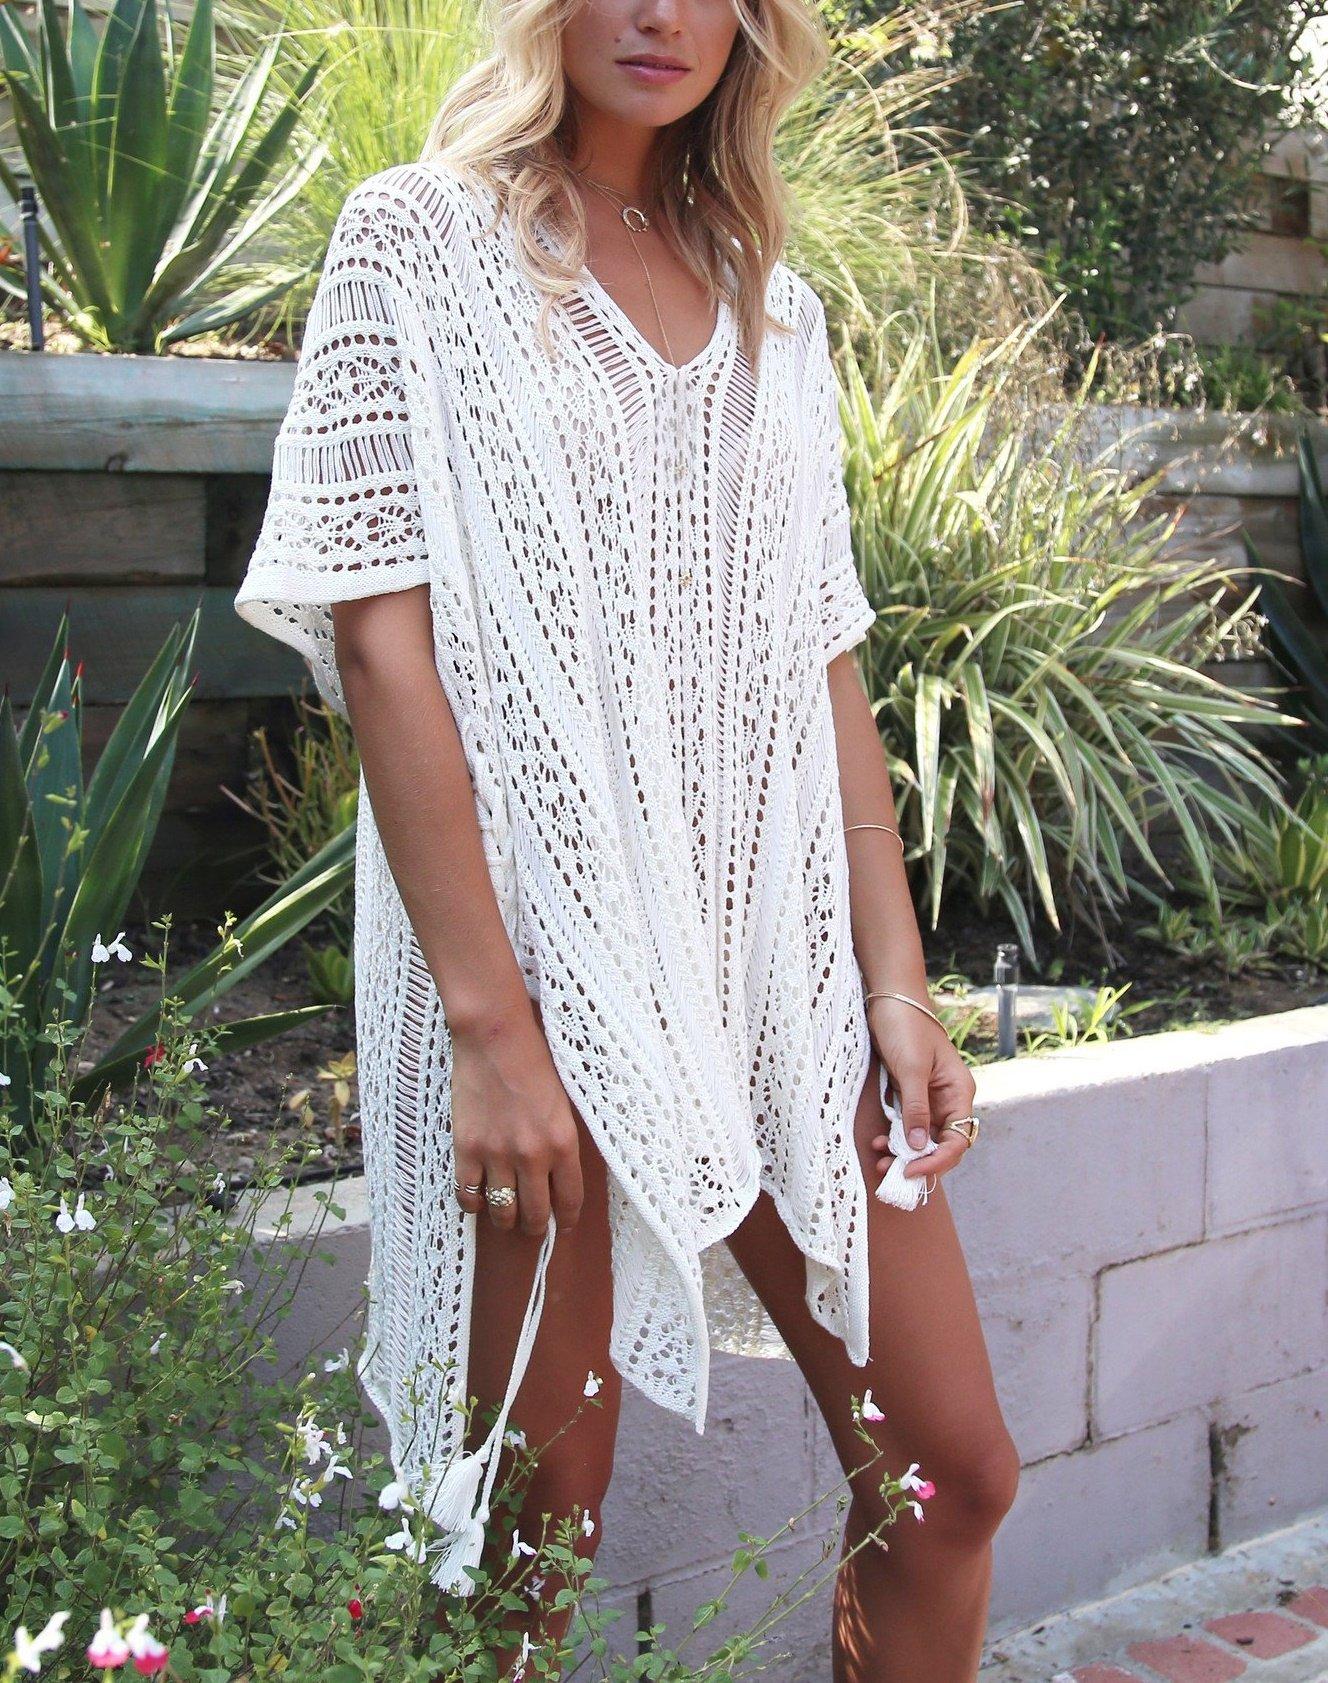 Lealac Women's Summer Cotton Bathing Suit Cover Up Beach Bikini Swimsuit Swimwear Crochet Dress Gift For Women LXF13 White by LeaLac (Image #3)